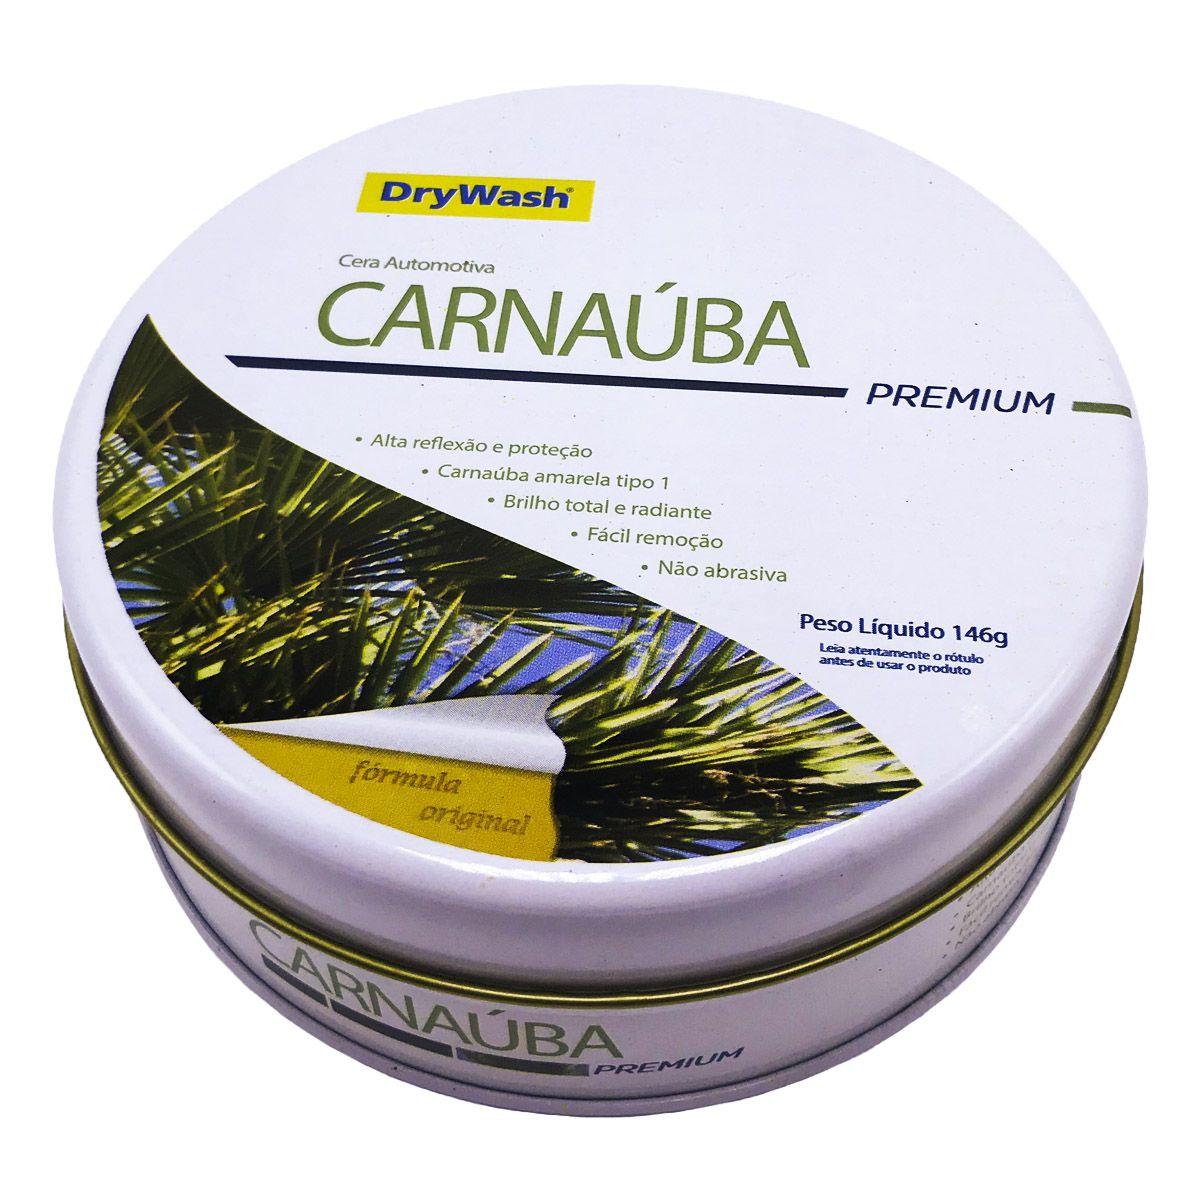 Cera Carnaúba Premium Drywash 146g